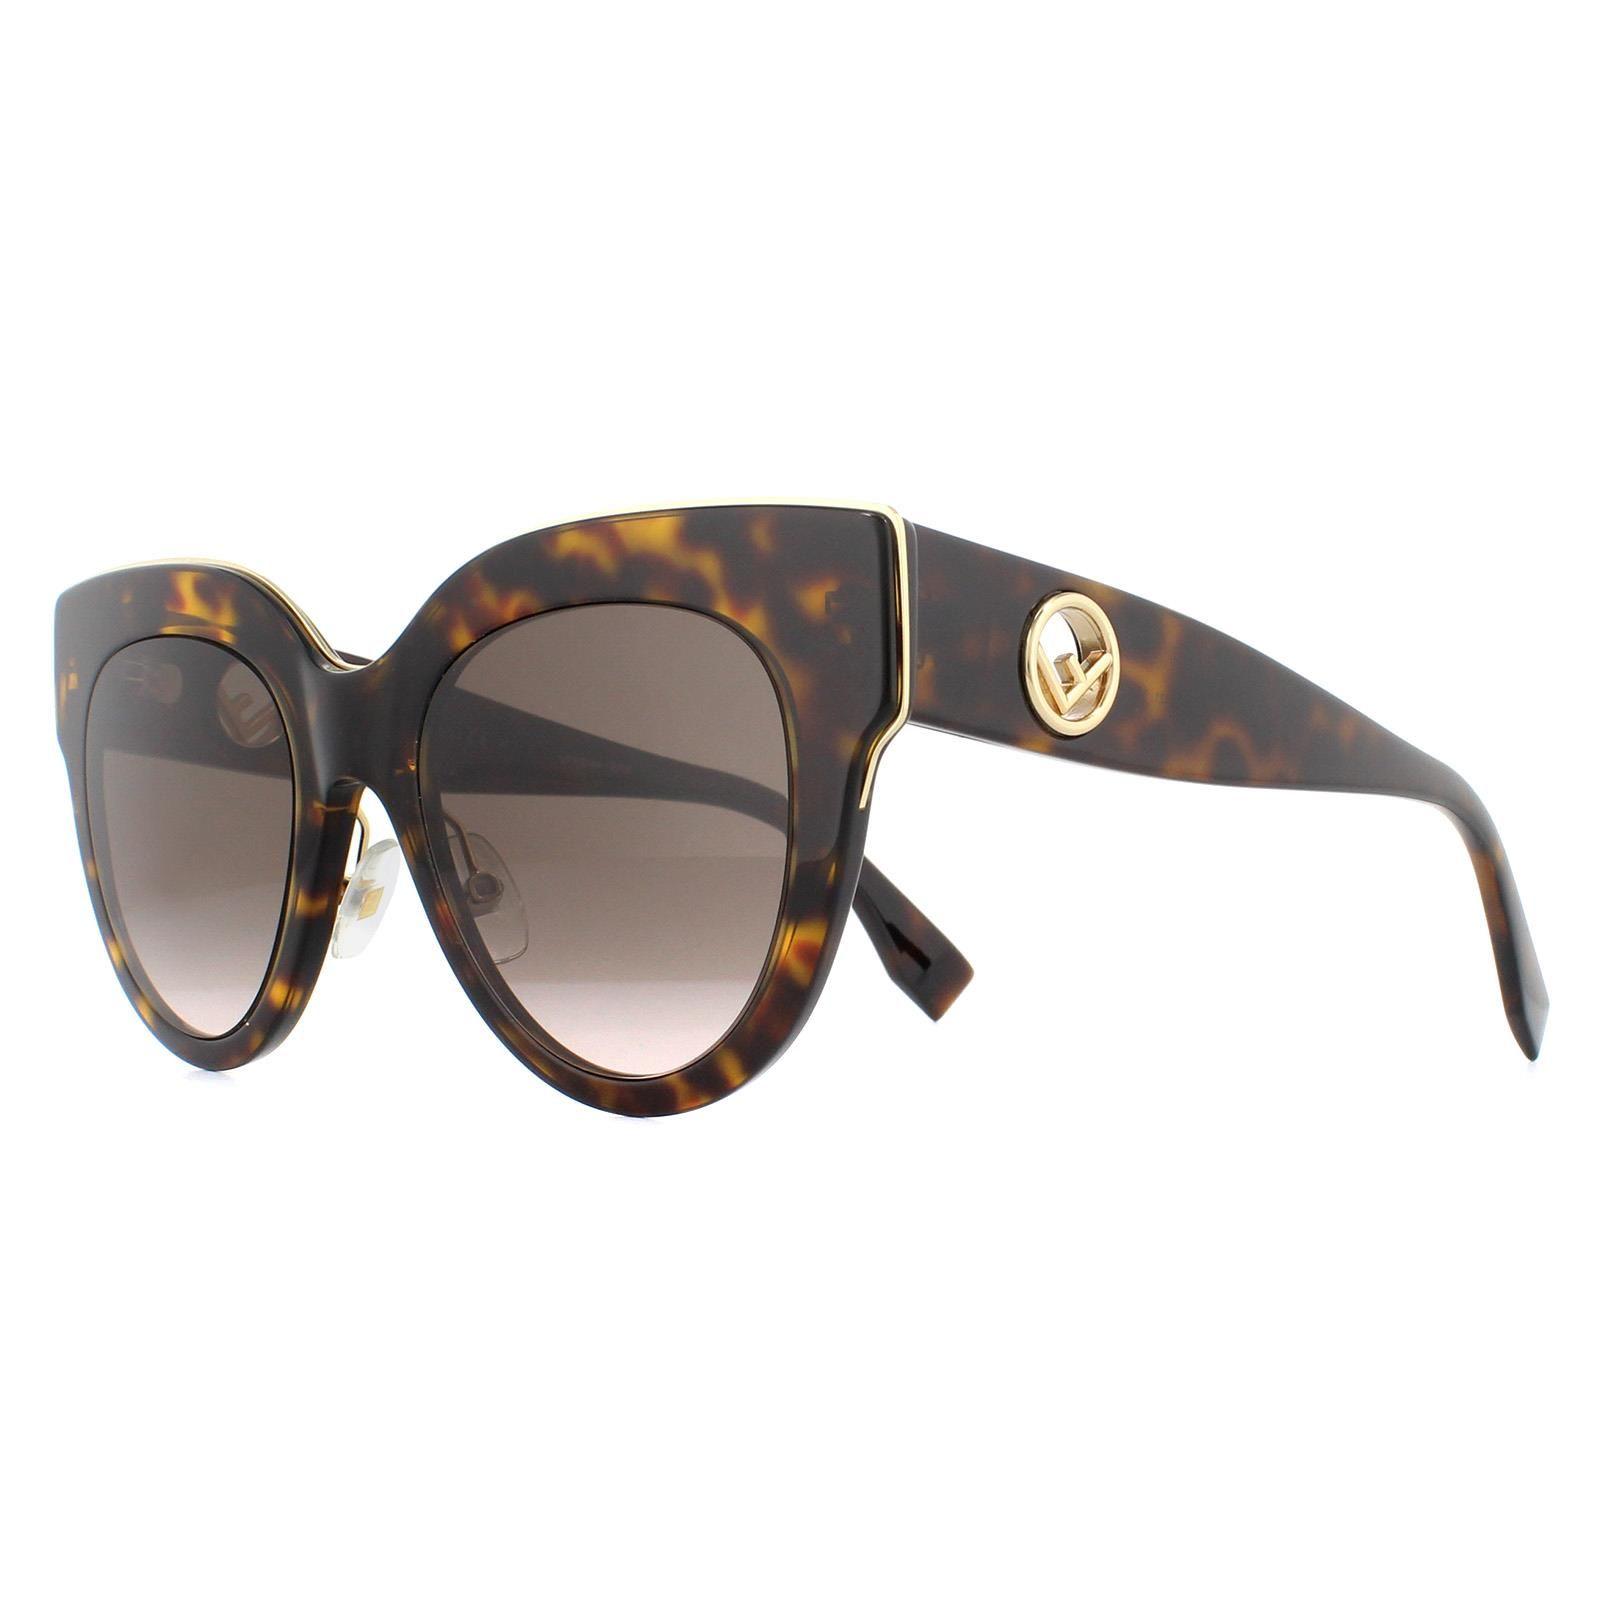 Fendi Sunglasses FF 0360/G/S H7P KU Tortoise with Black Fendi Pattern Blue